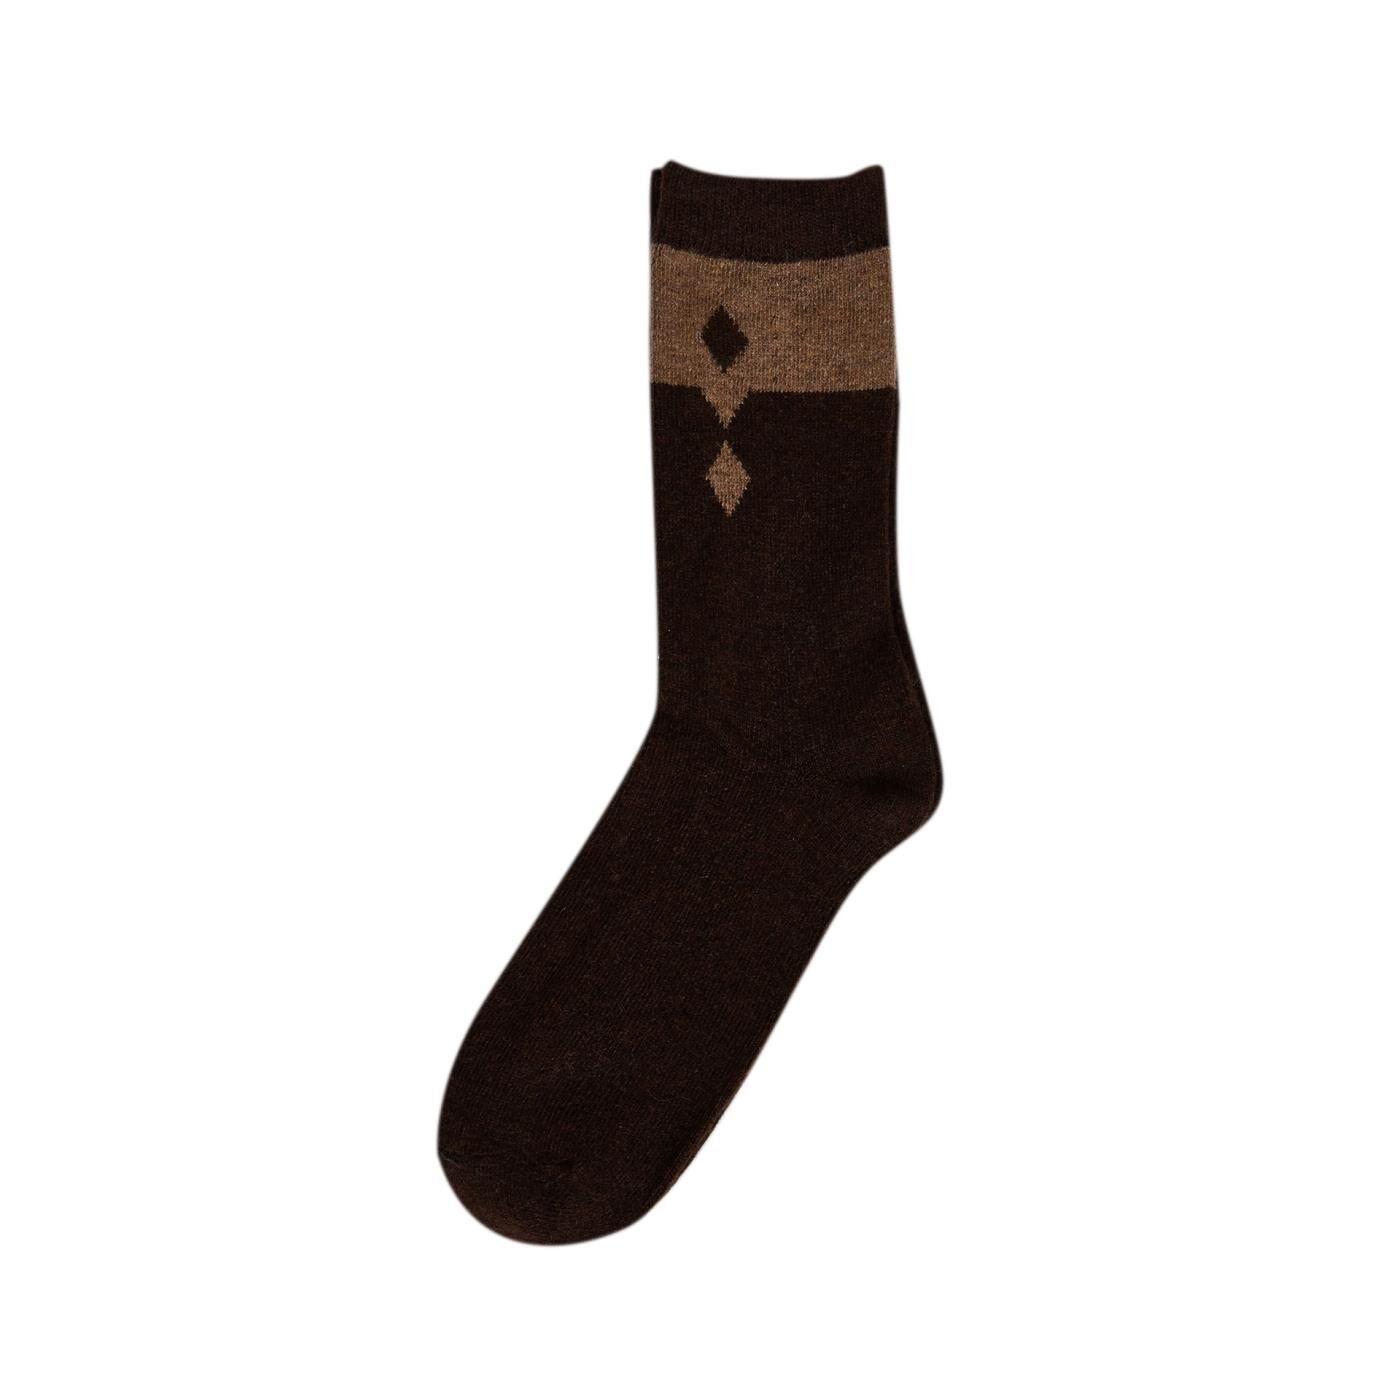 Celestino Aνδρικές κάλτσες με μαλλί  - Καφε σκουρο - Grootte: One Size